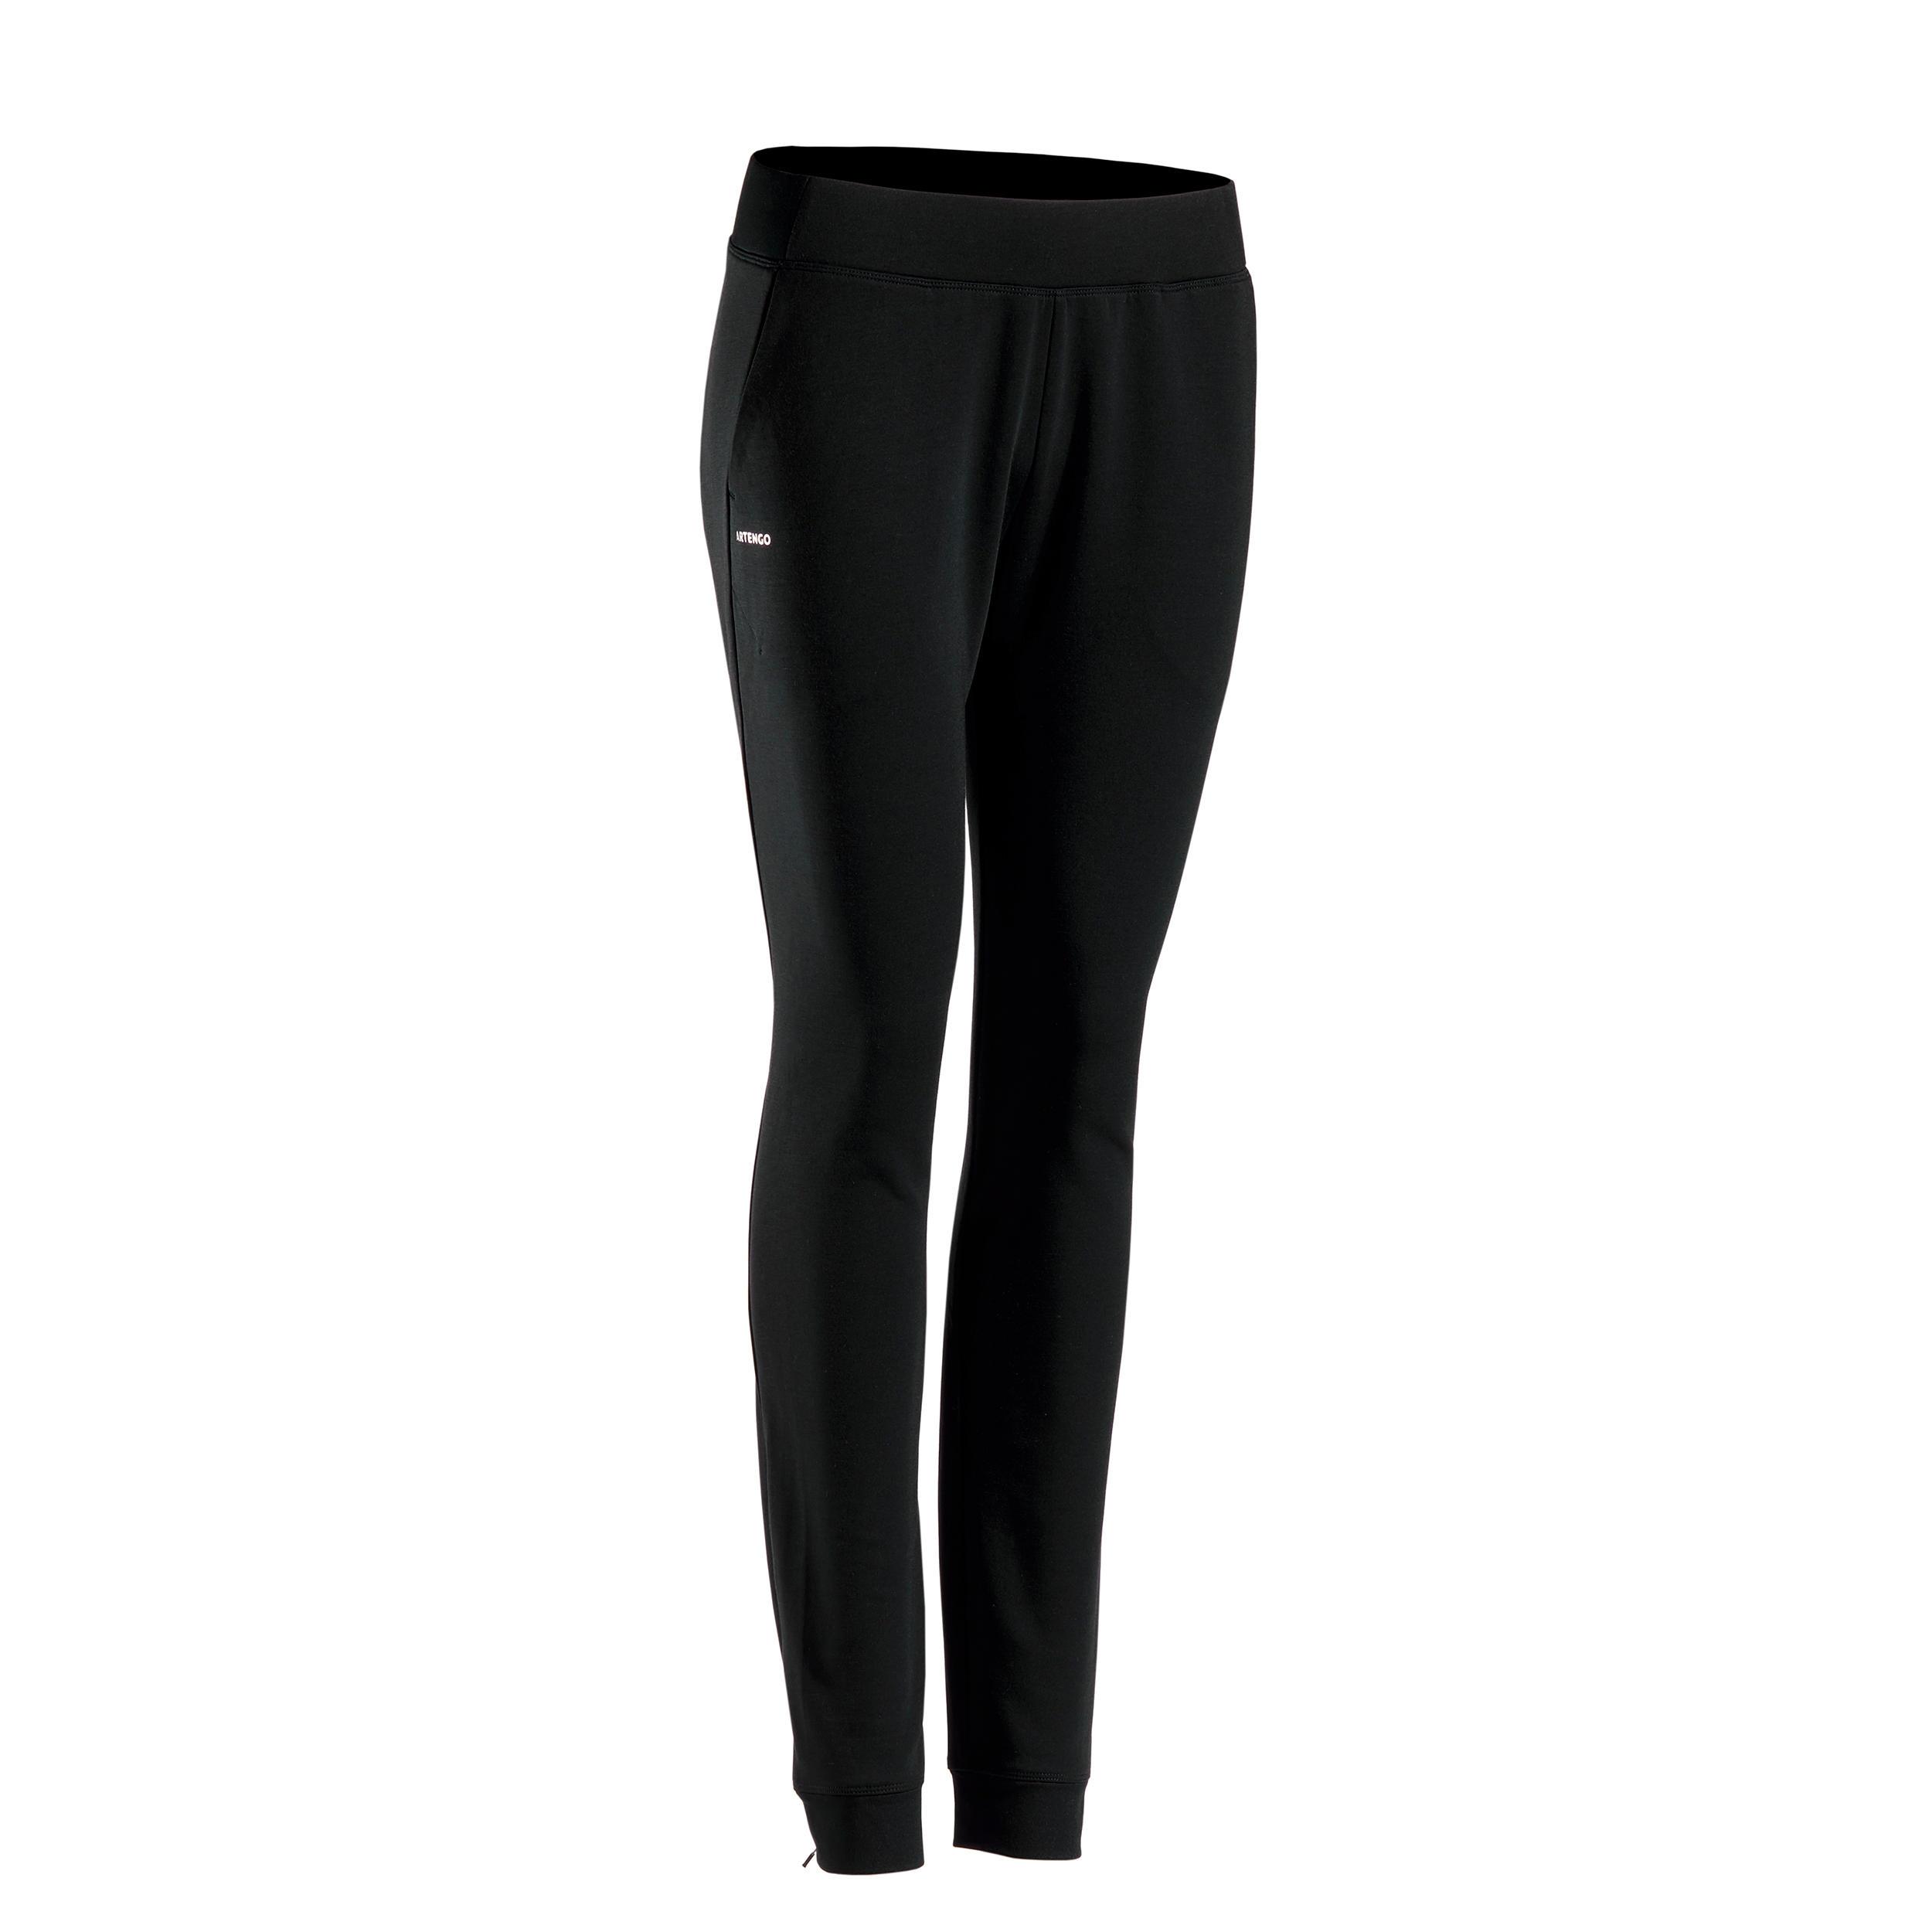 Pantalon Tenis Dry 900 Damă imagine